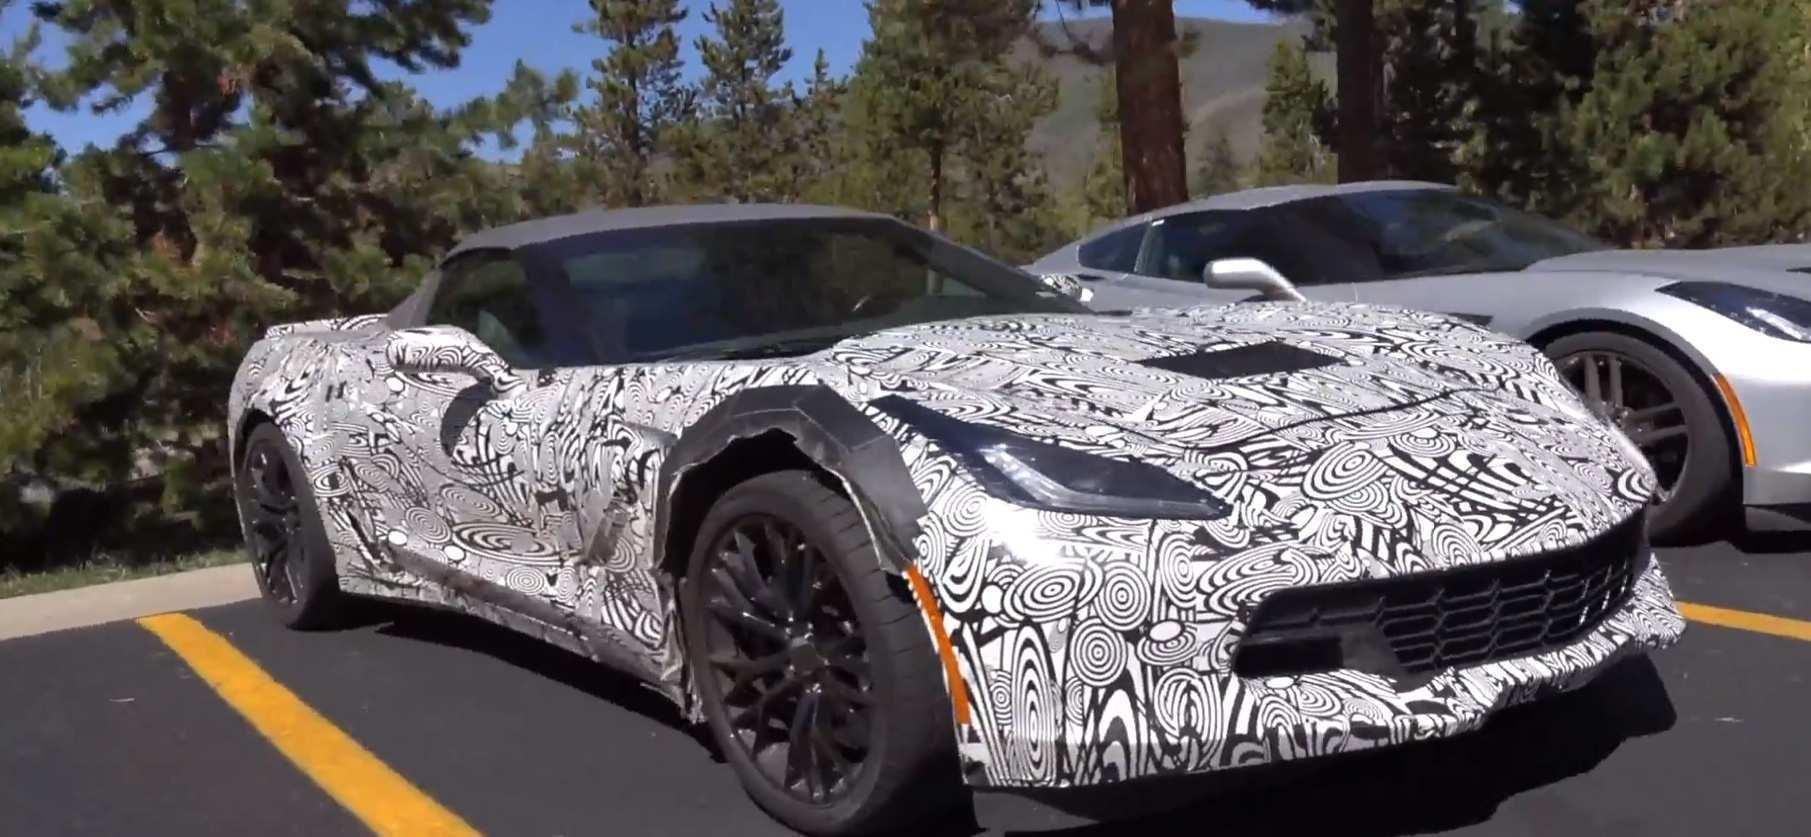 83 Great 2020 Chevrolet Corvette Z06 Pictures by 2020 Chevrolet Corvette Z06